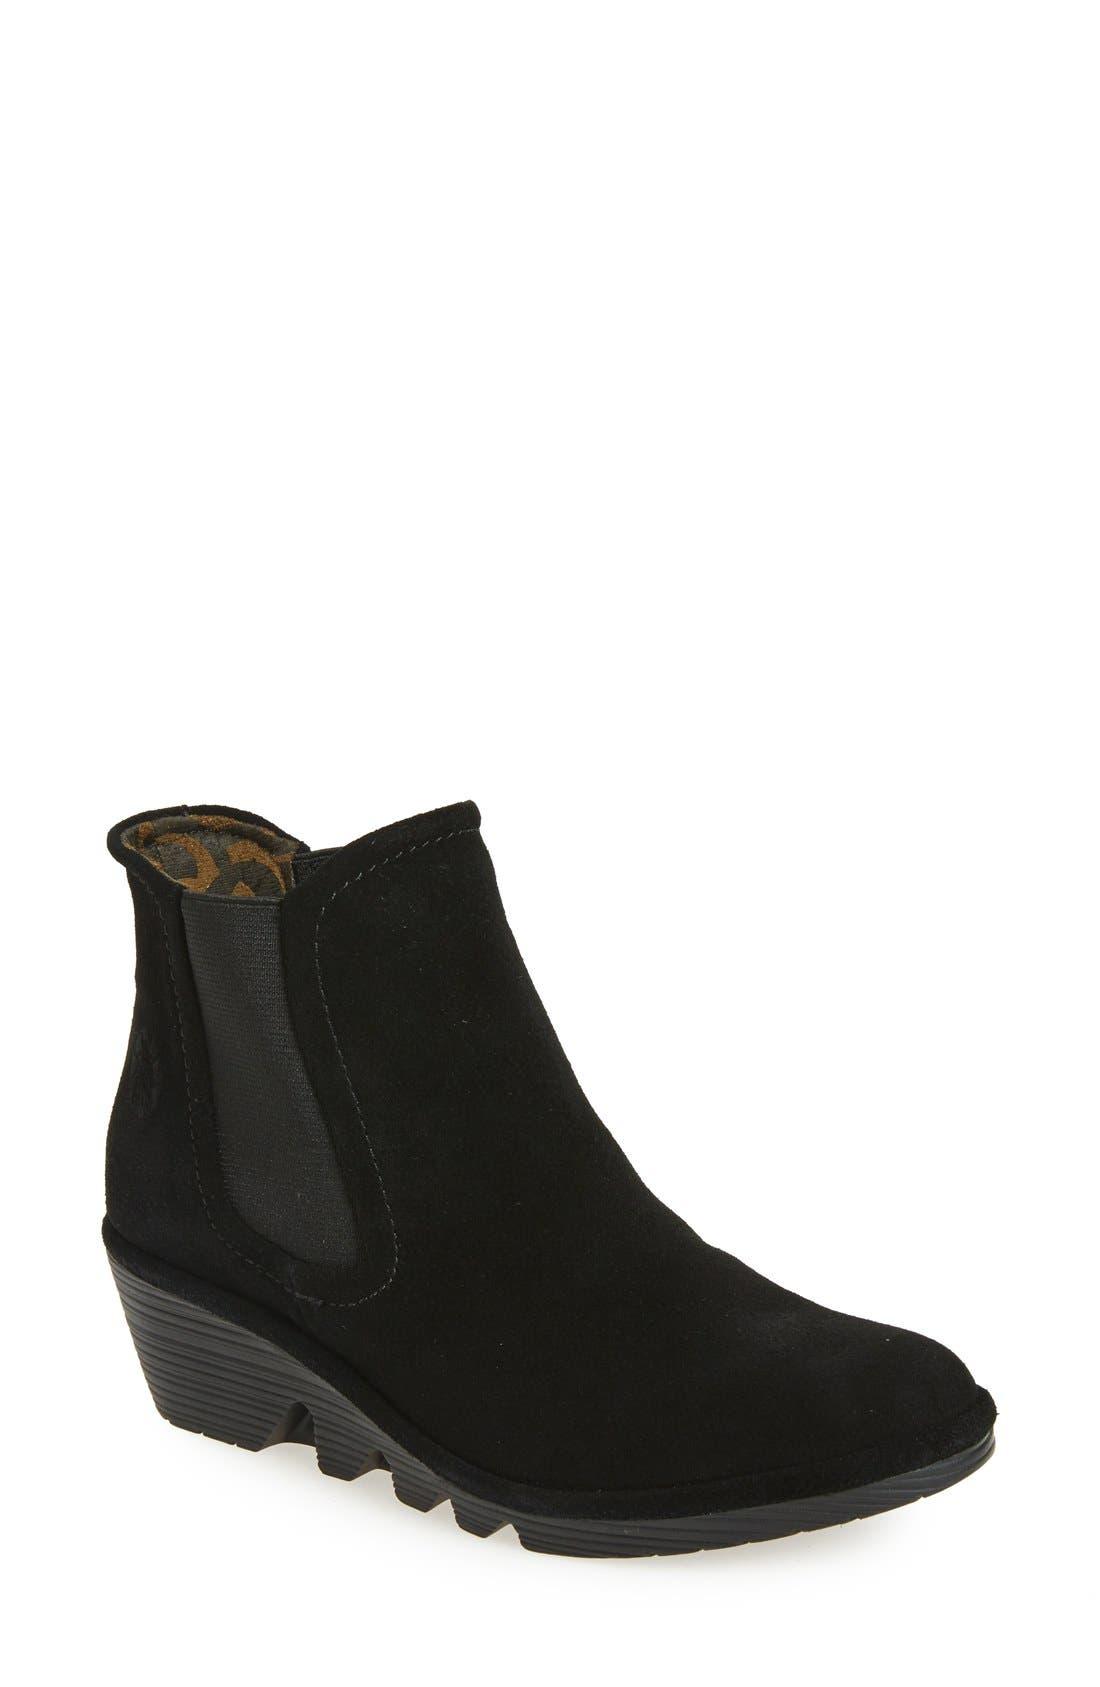 Main Image - Fly London 'Phil' Chelsea Boot (Women)